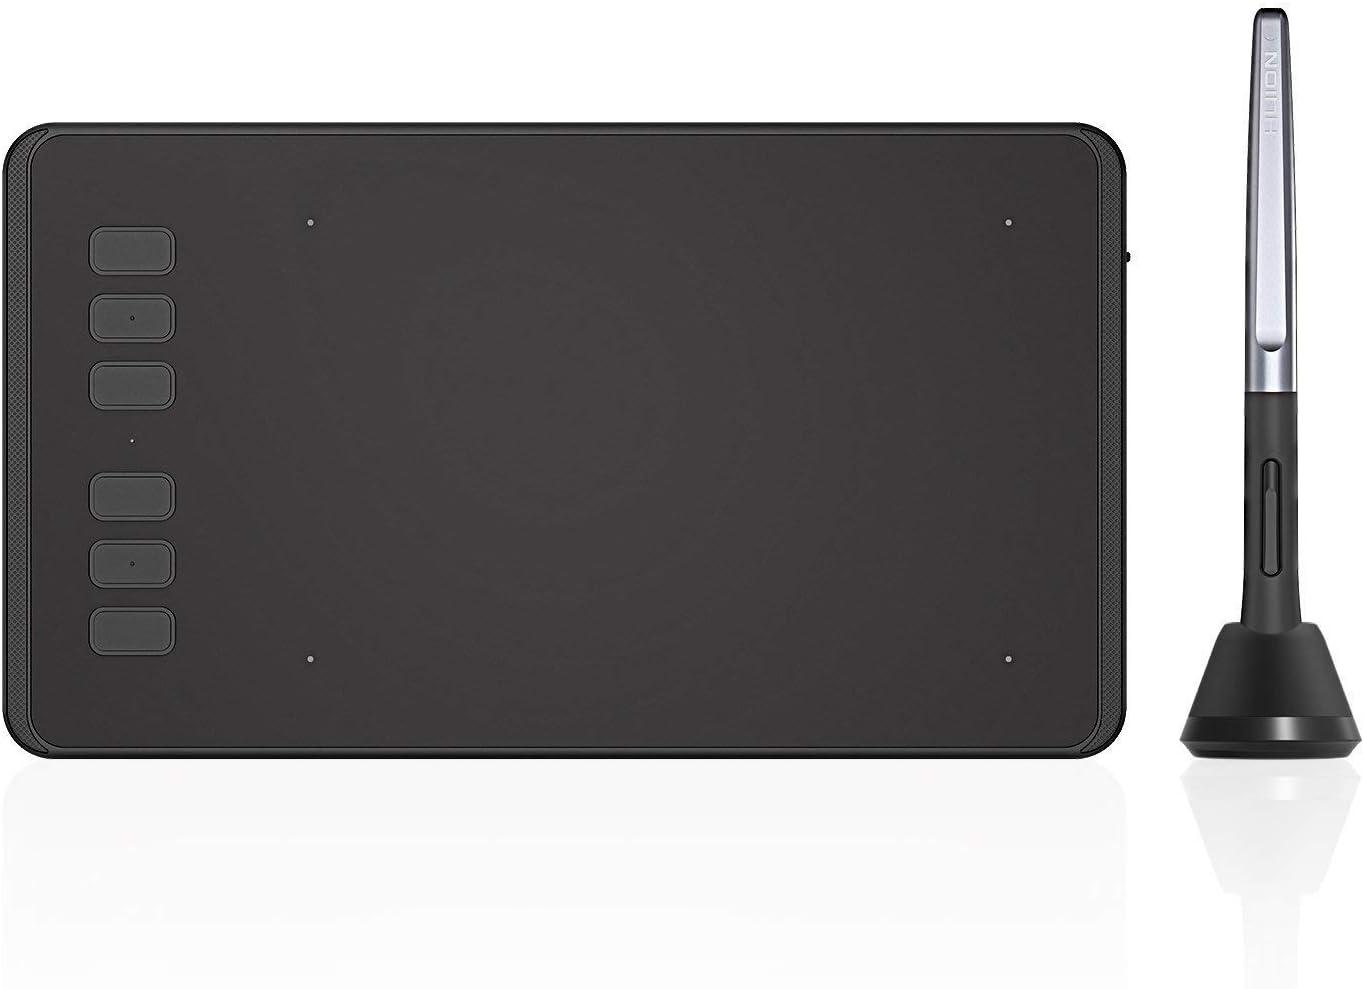 Huion H640p 8192 Pressure Sensitivity Graphics Tablet Computers Accessories